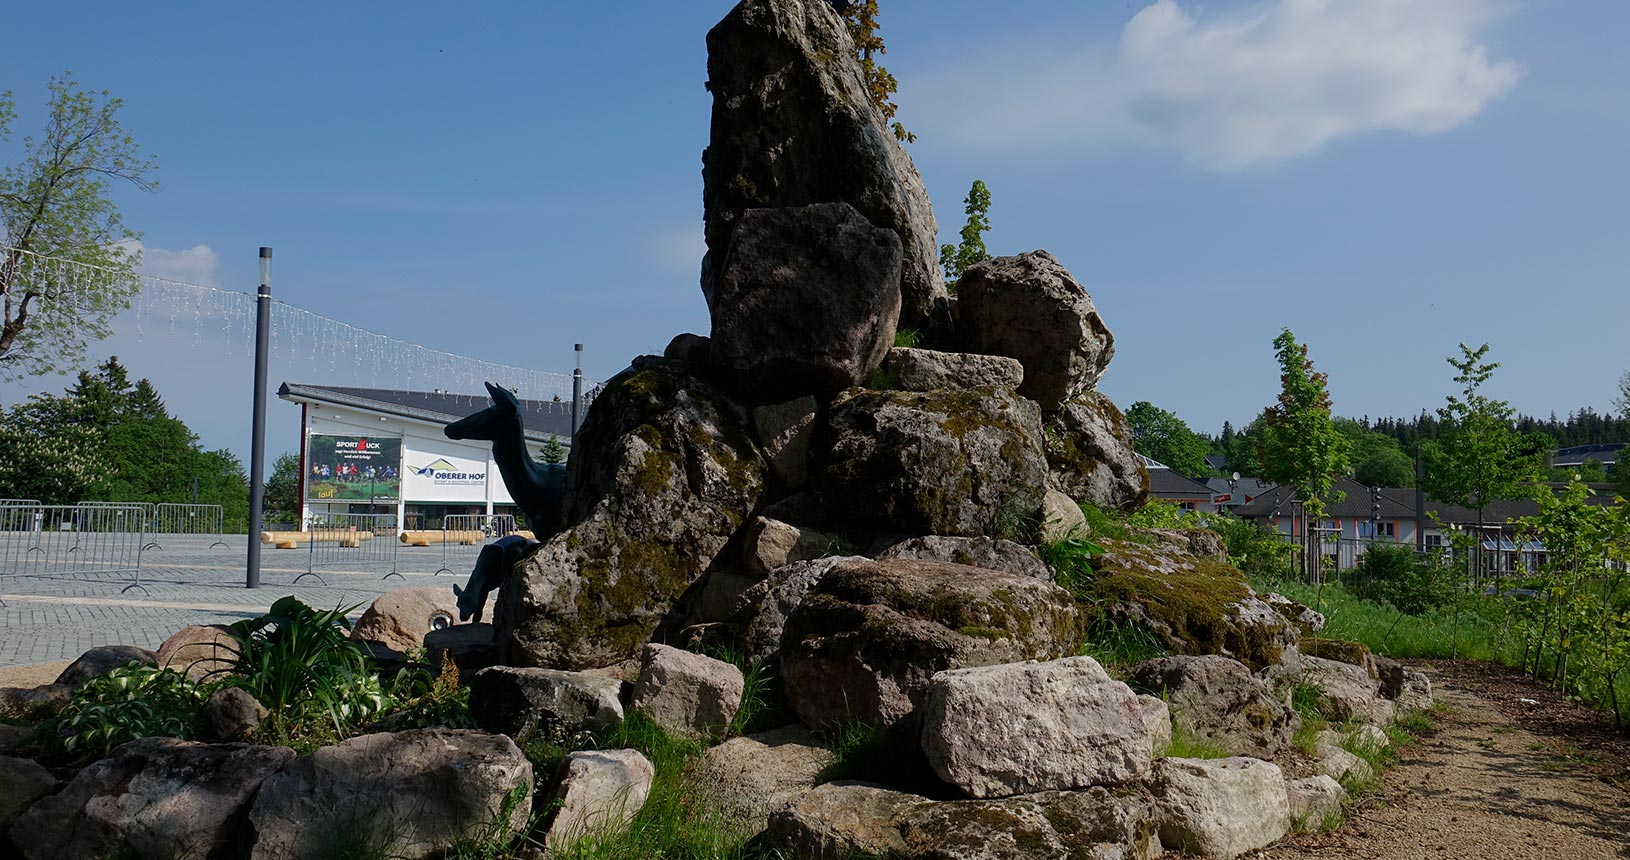 Oberhof im Sommer, Denkmal am Stadtplatz